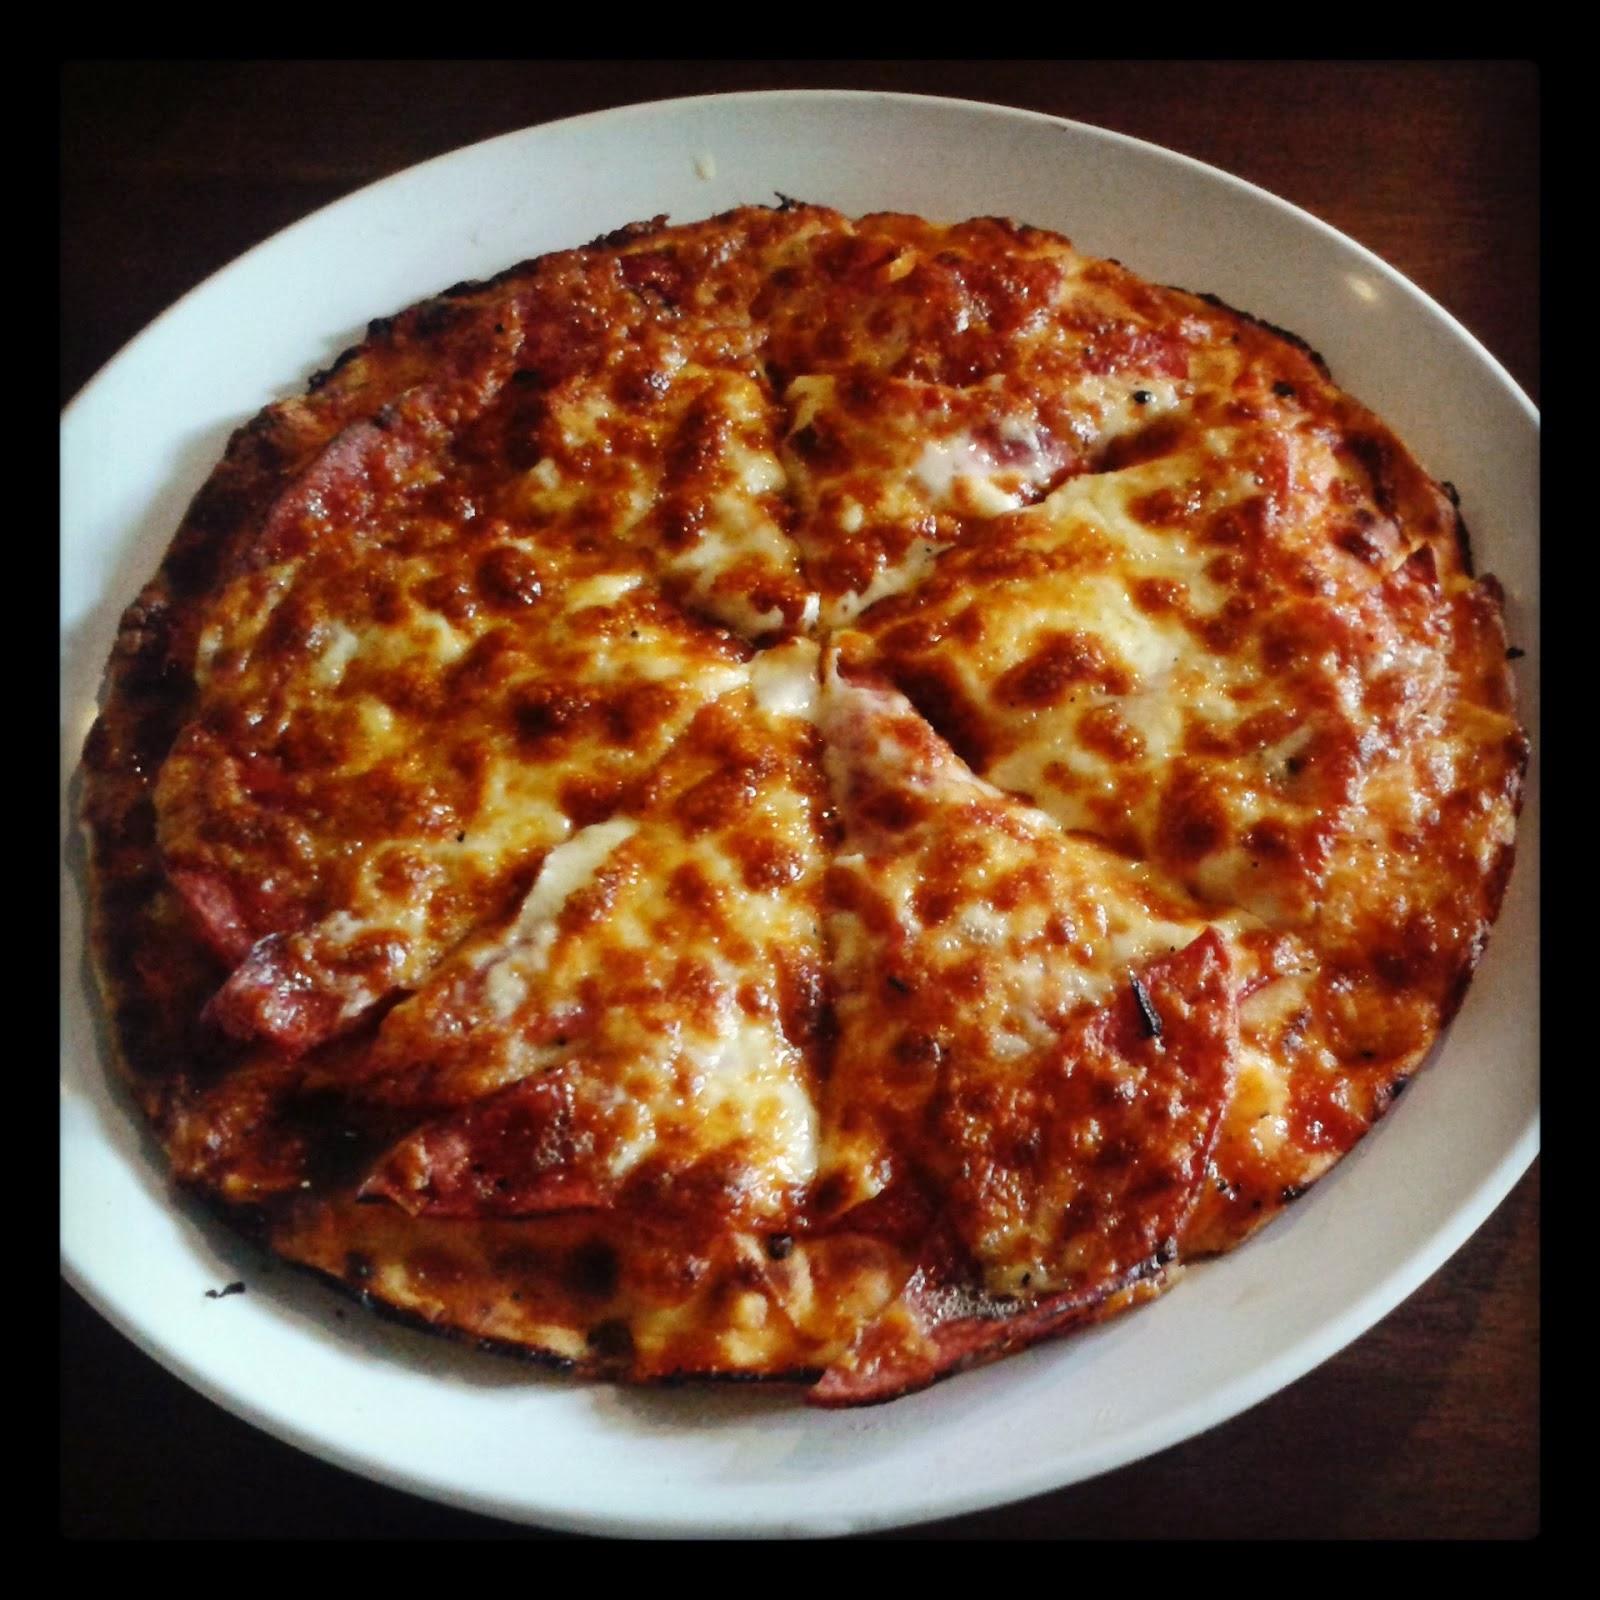 Kedai Kita Pizza Kayu Bakar